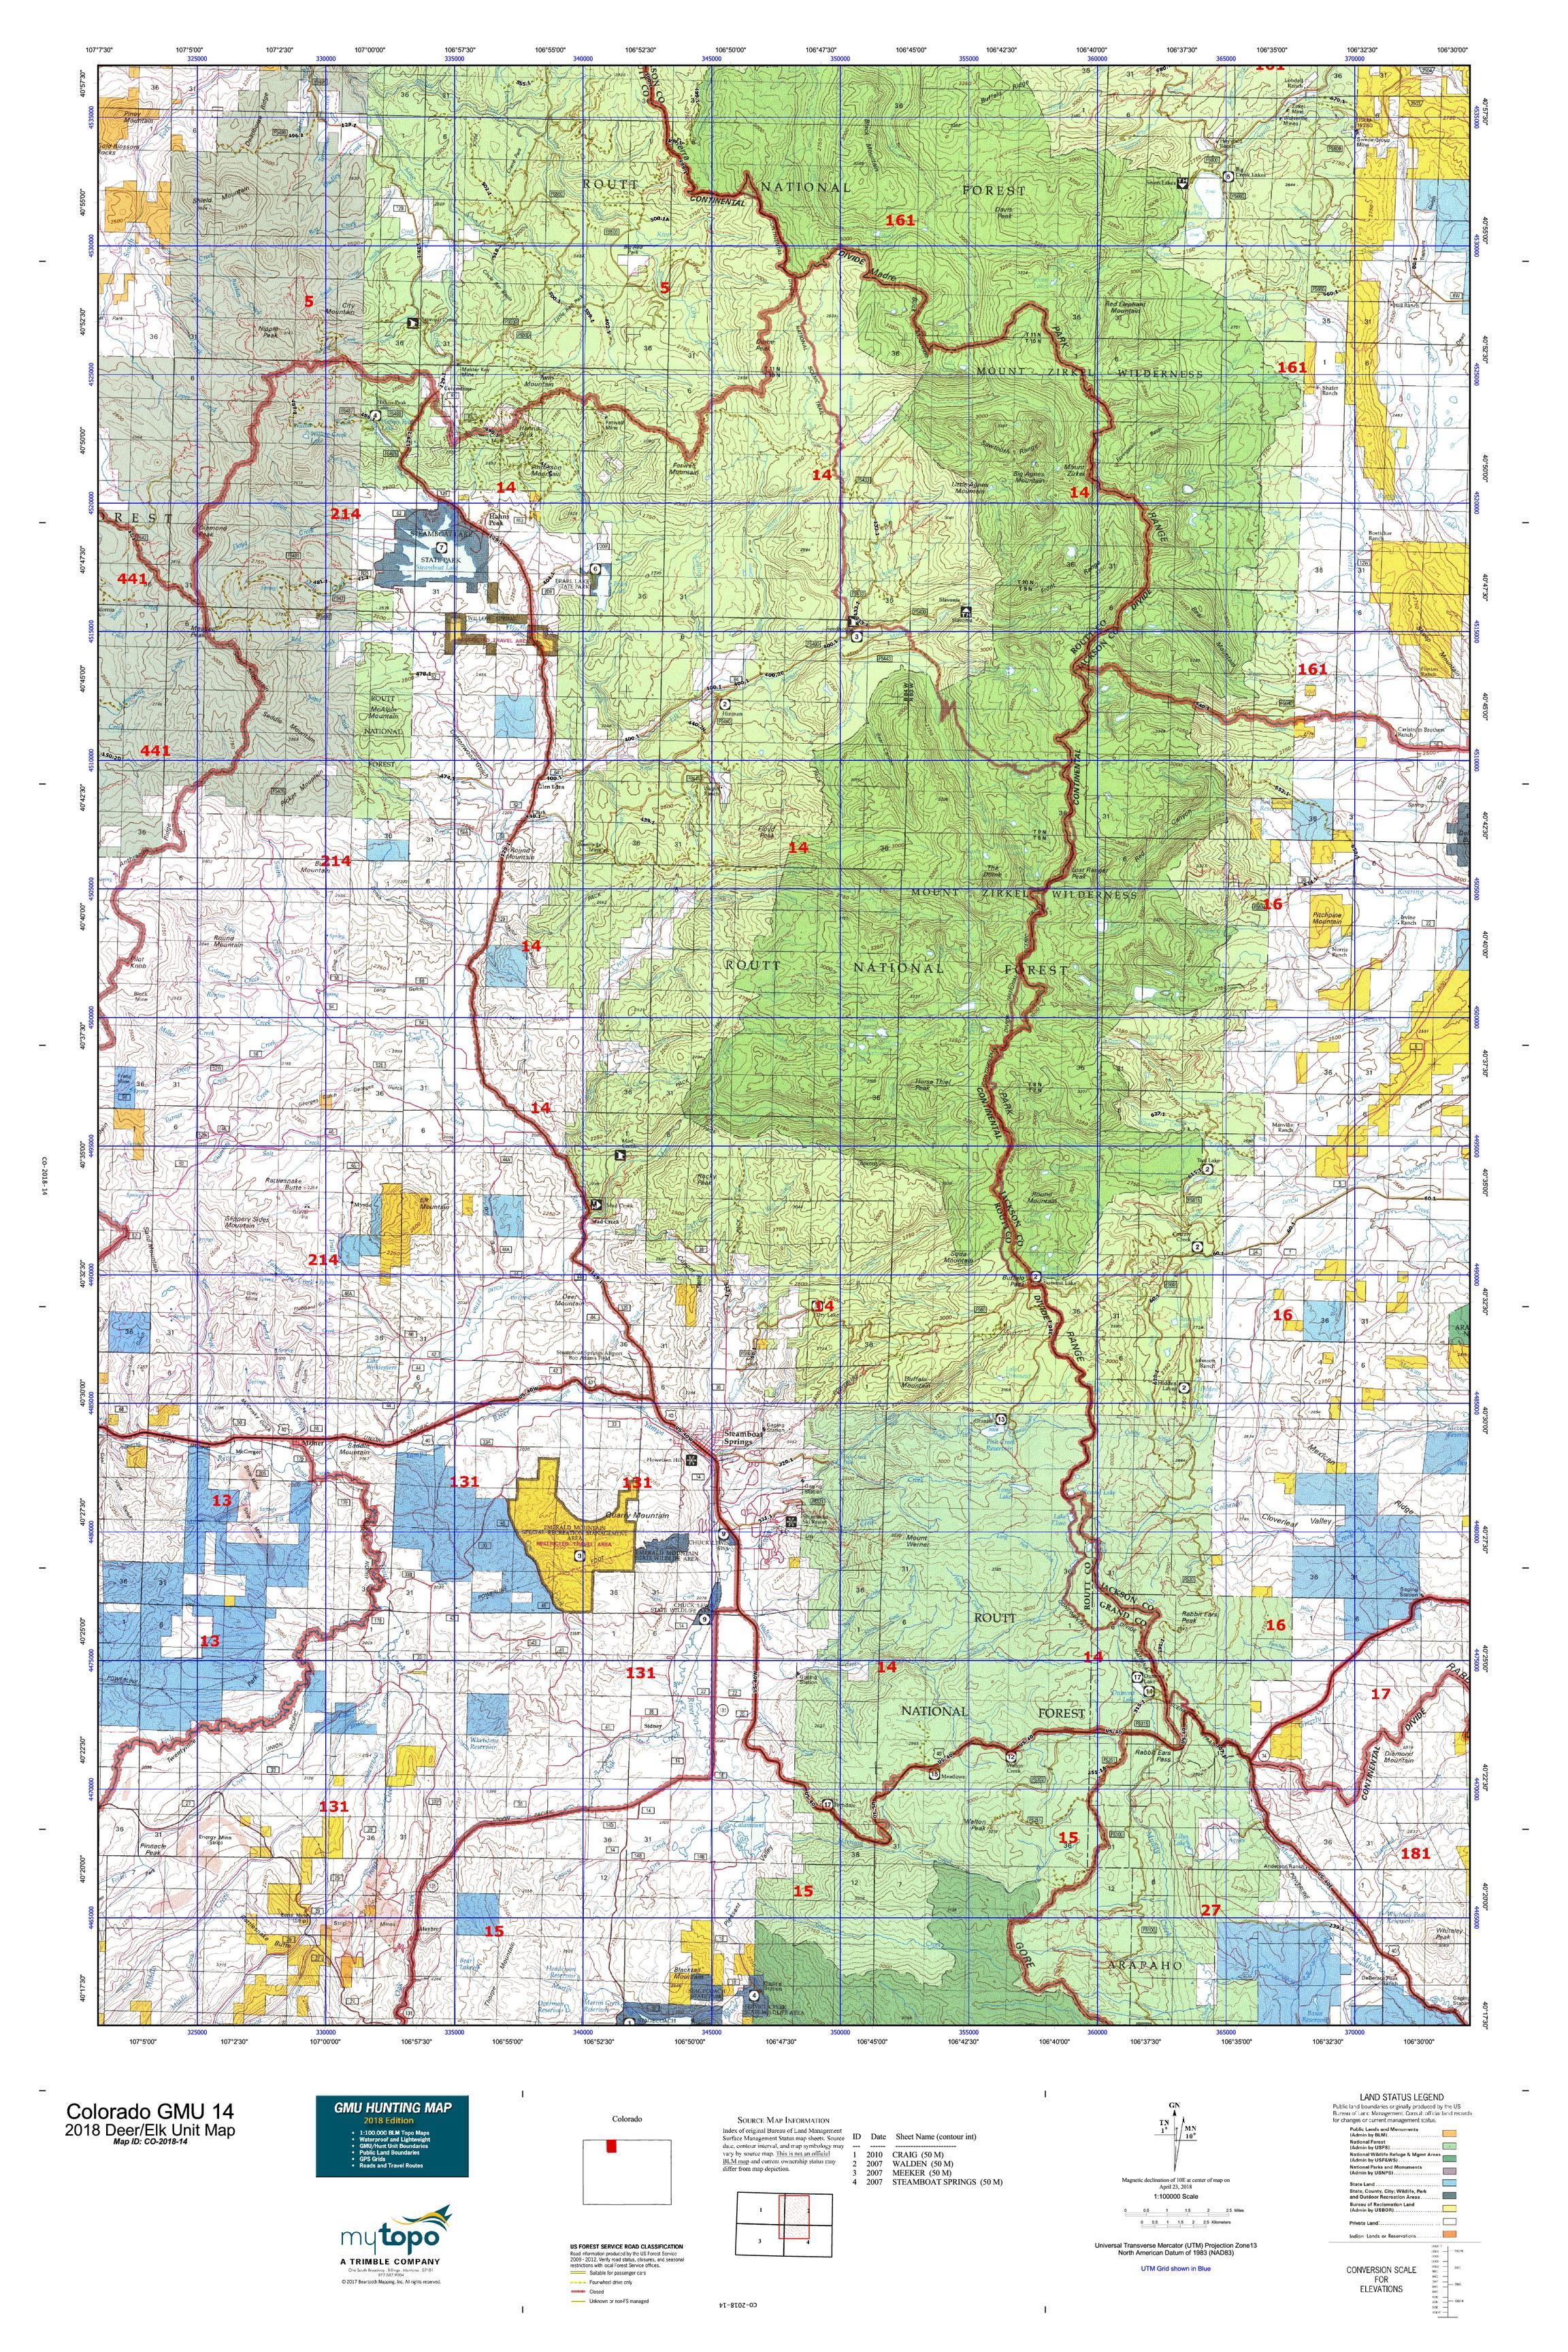 Colorado GMU 14 Map | MyTopo